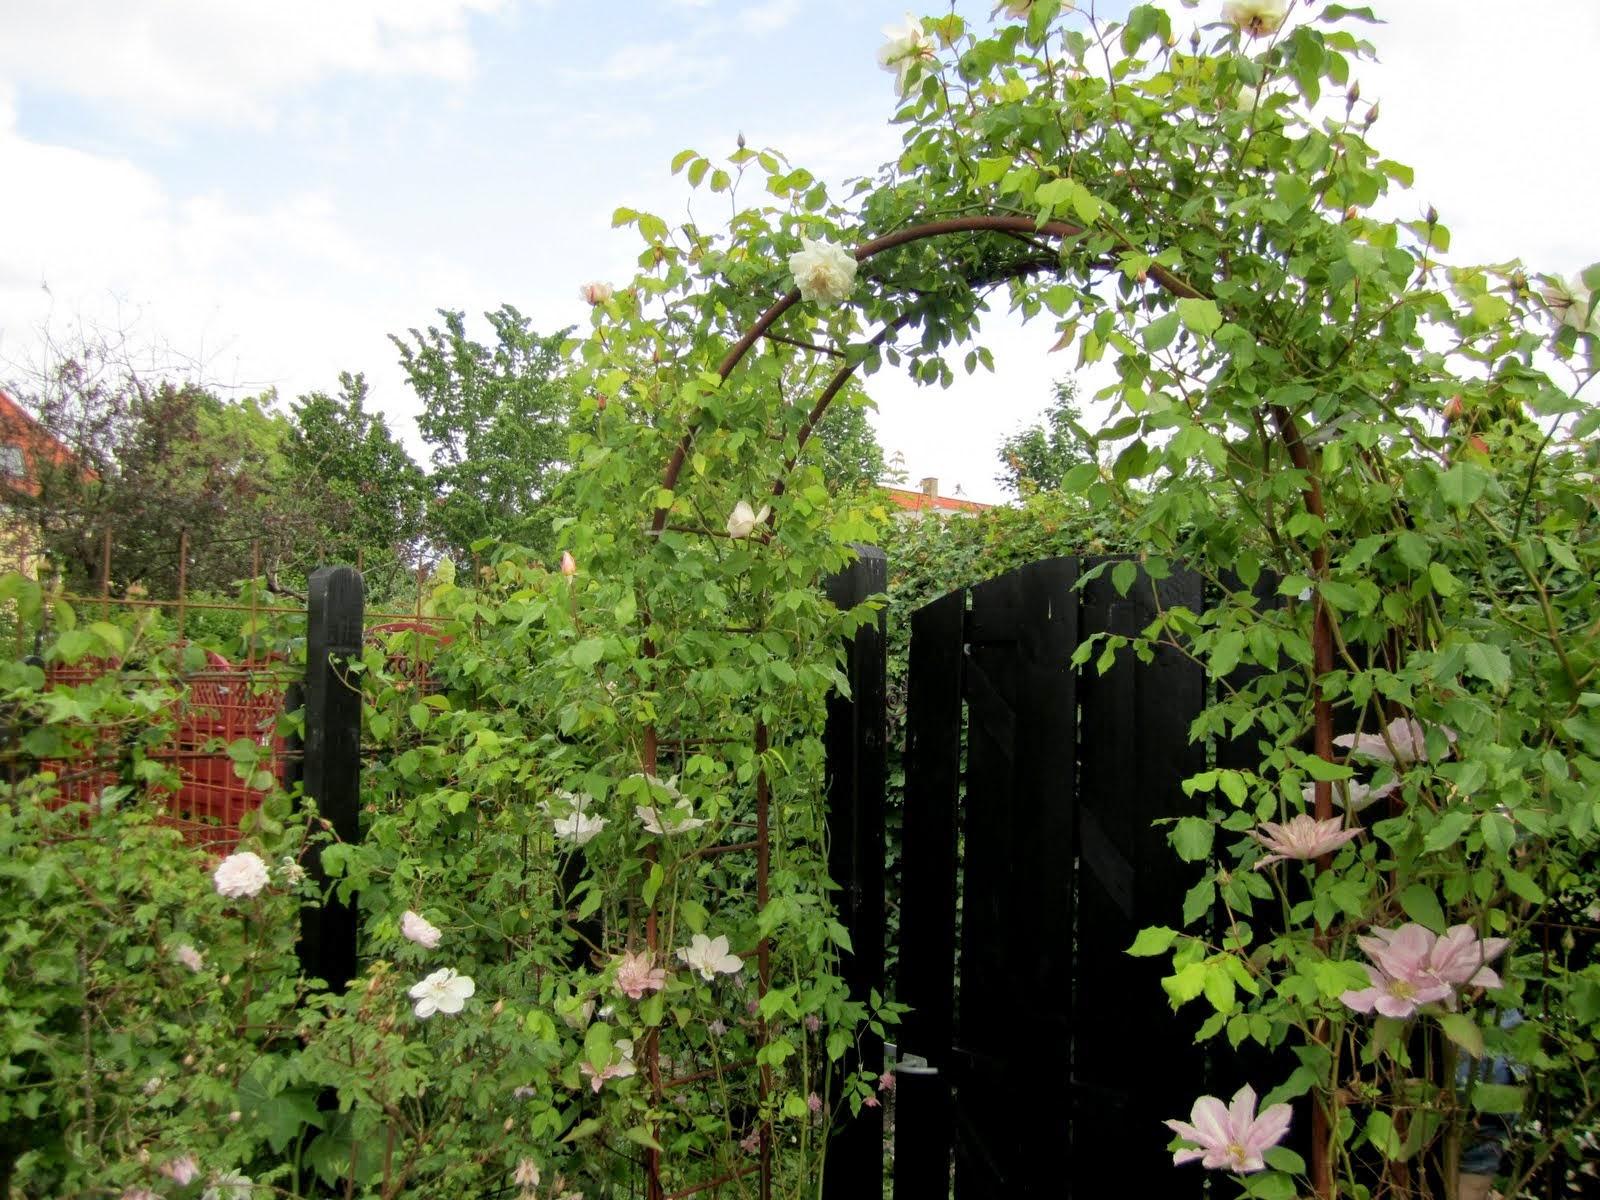 Nettes lille have: mine roser